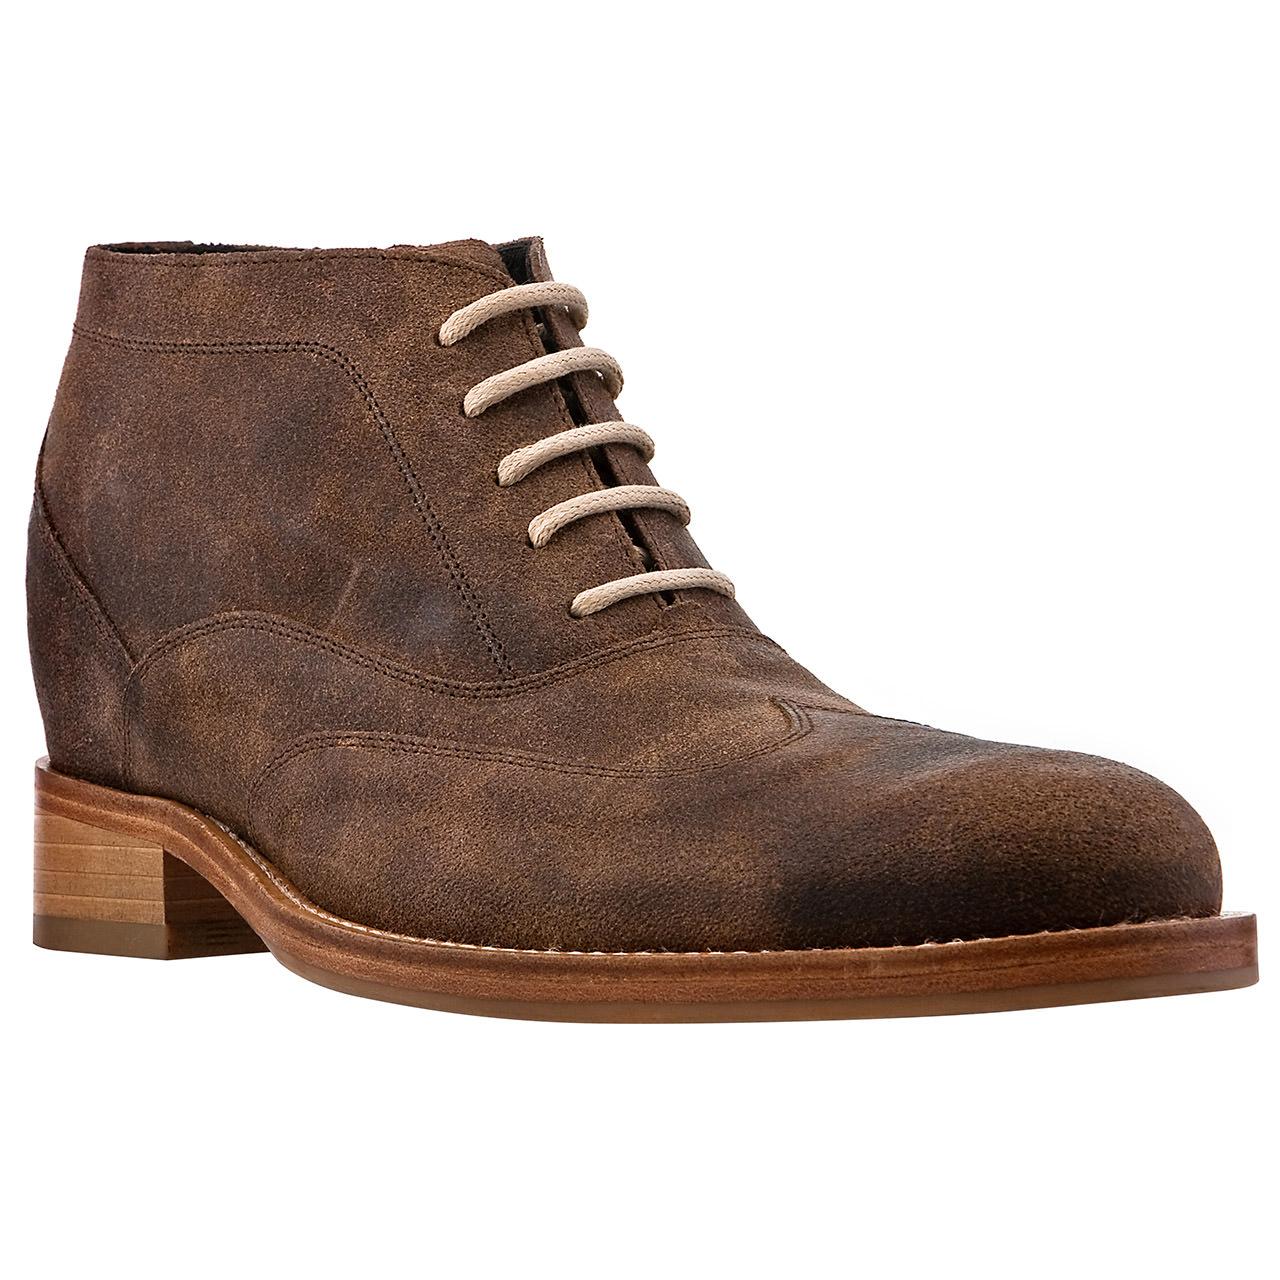 Arizona Luxury Elevator shoes for men | Guidomaggi